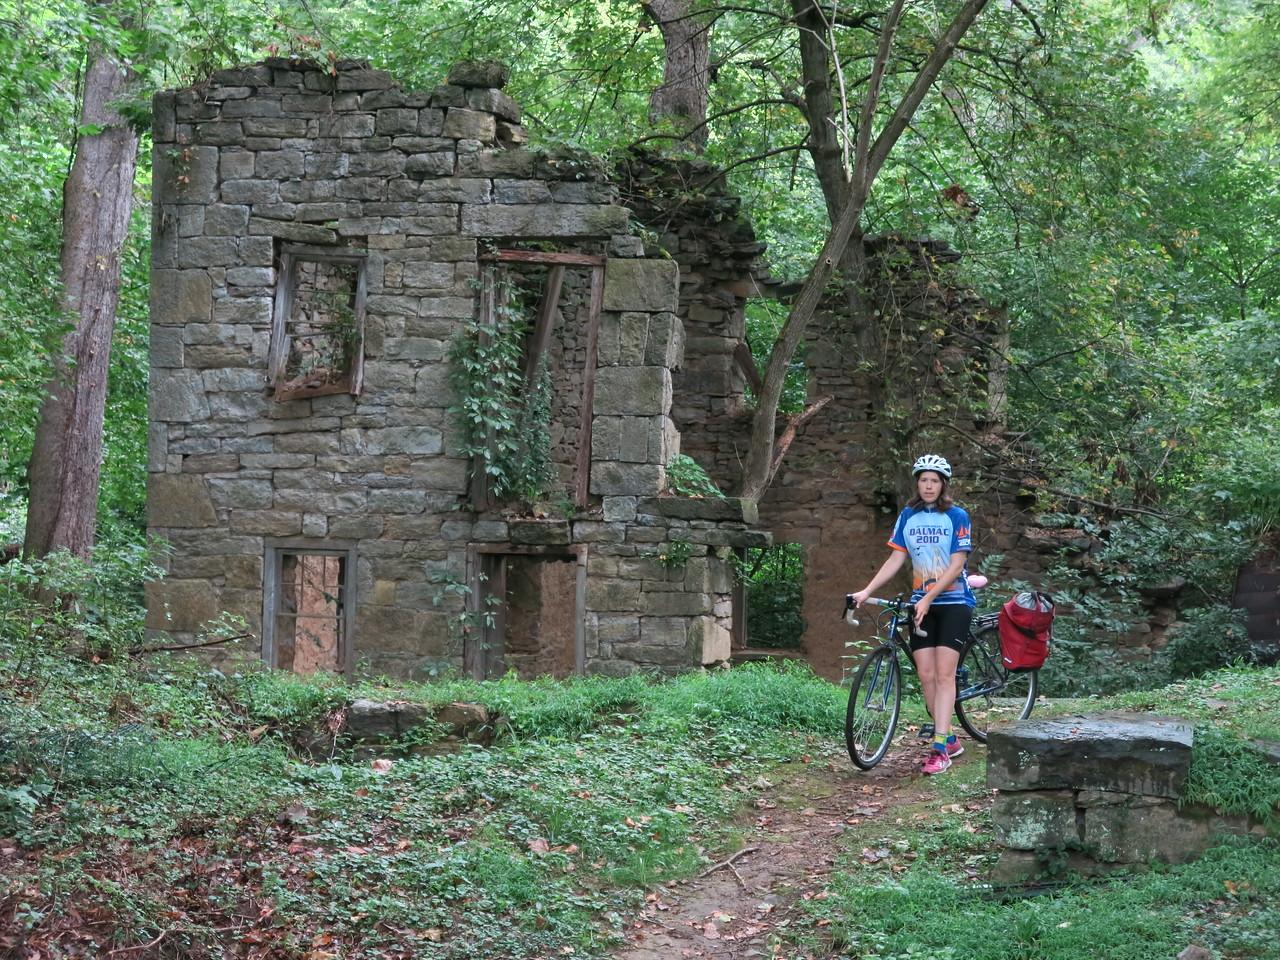 Charles Mill ruins, MP 108